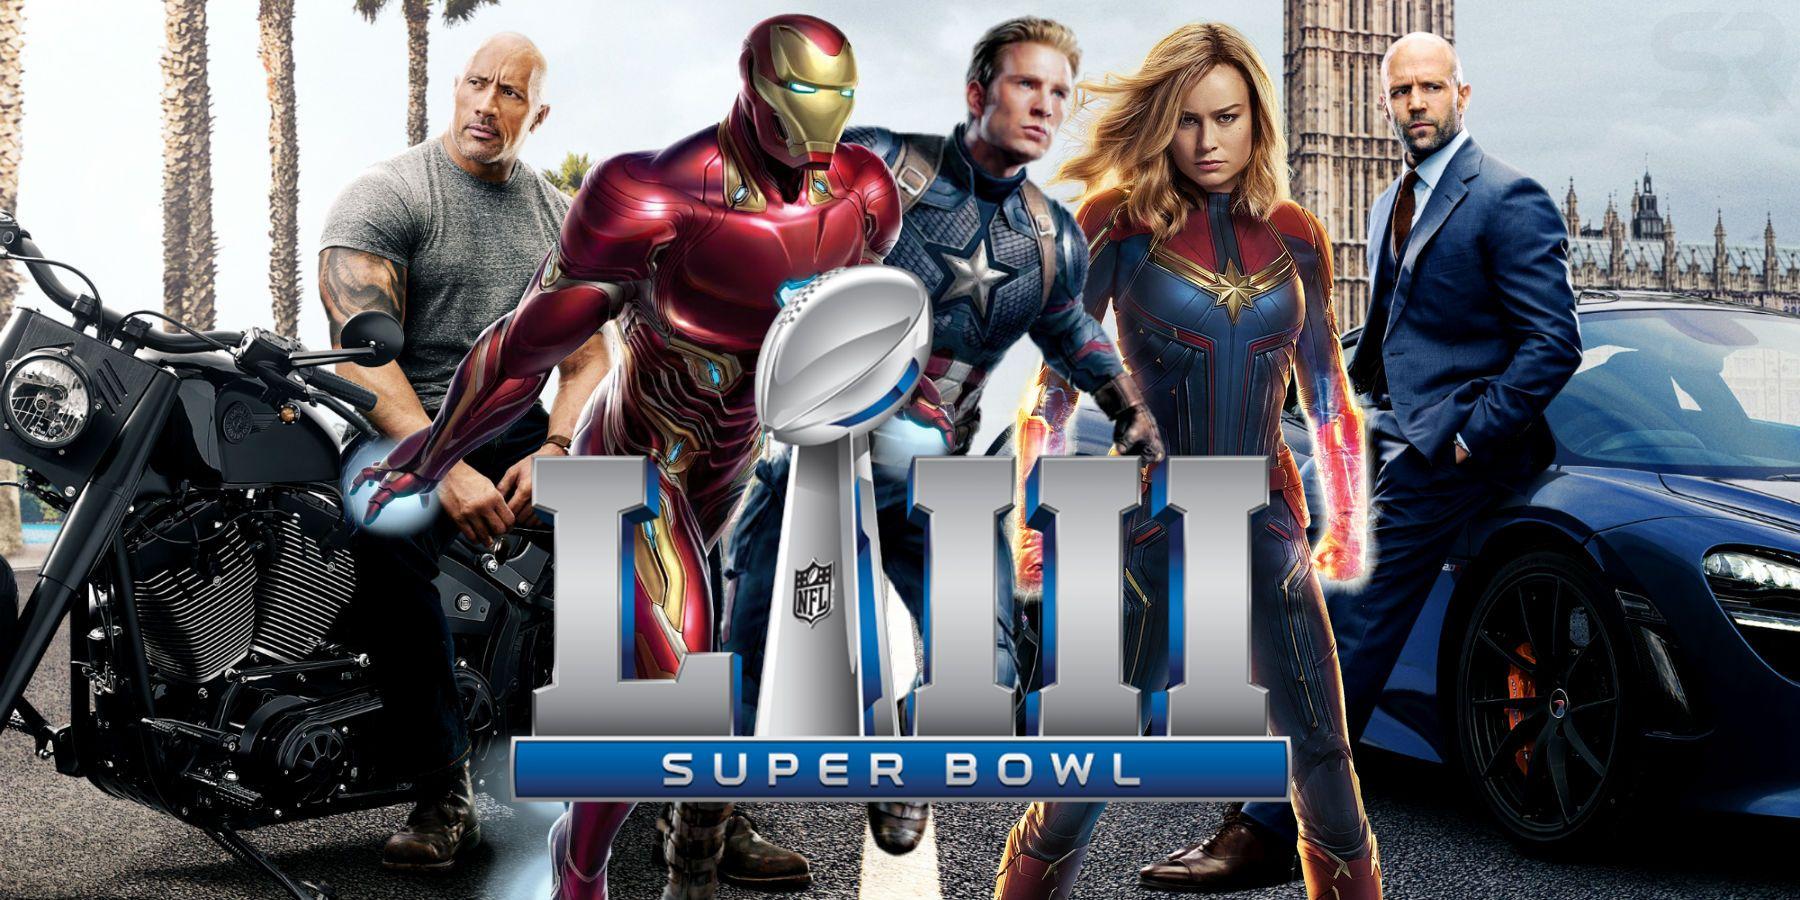 watch every super bowl 2019 movie trailer